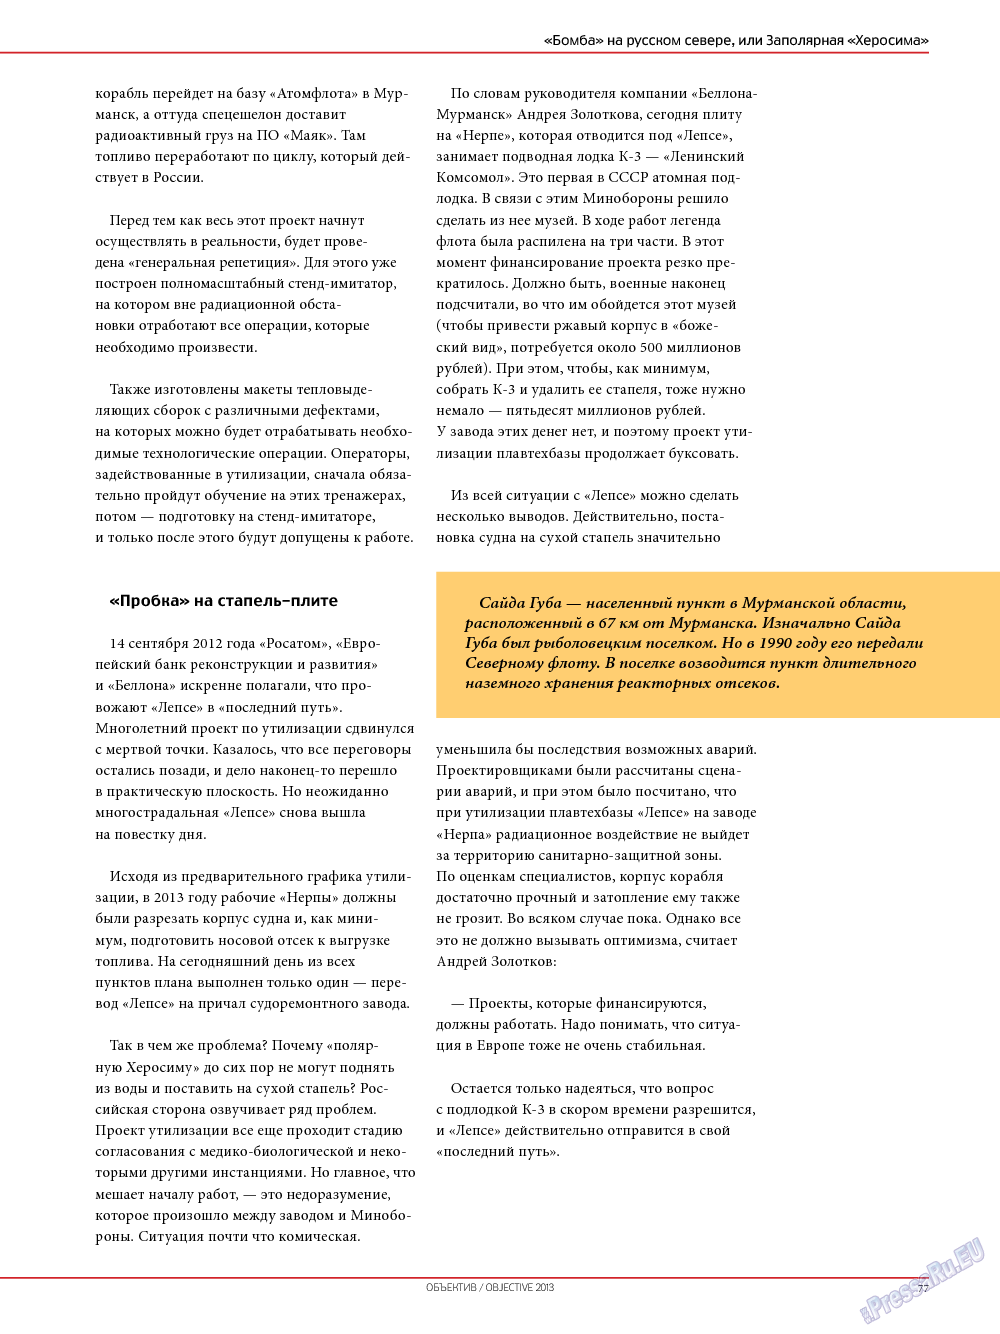 Объектив EU (журнал). 2013 год, номер 3, стр. 79